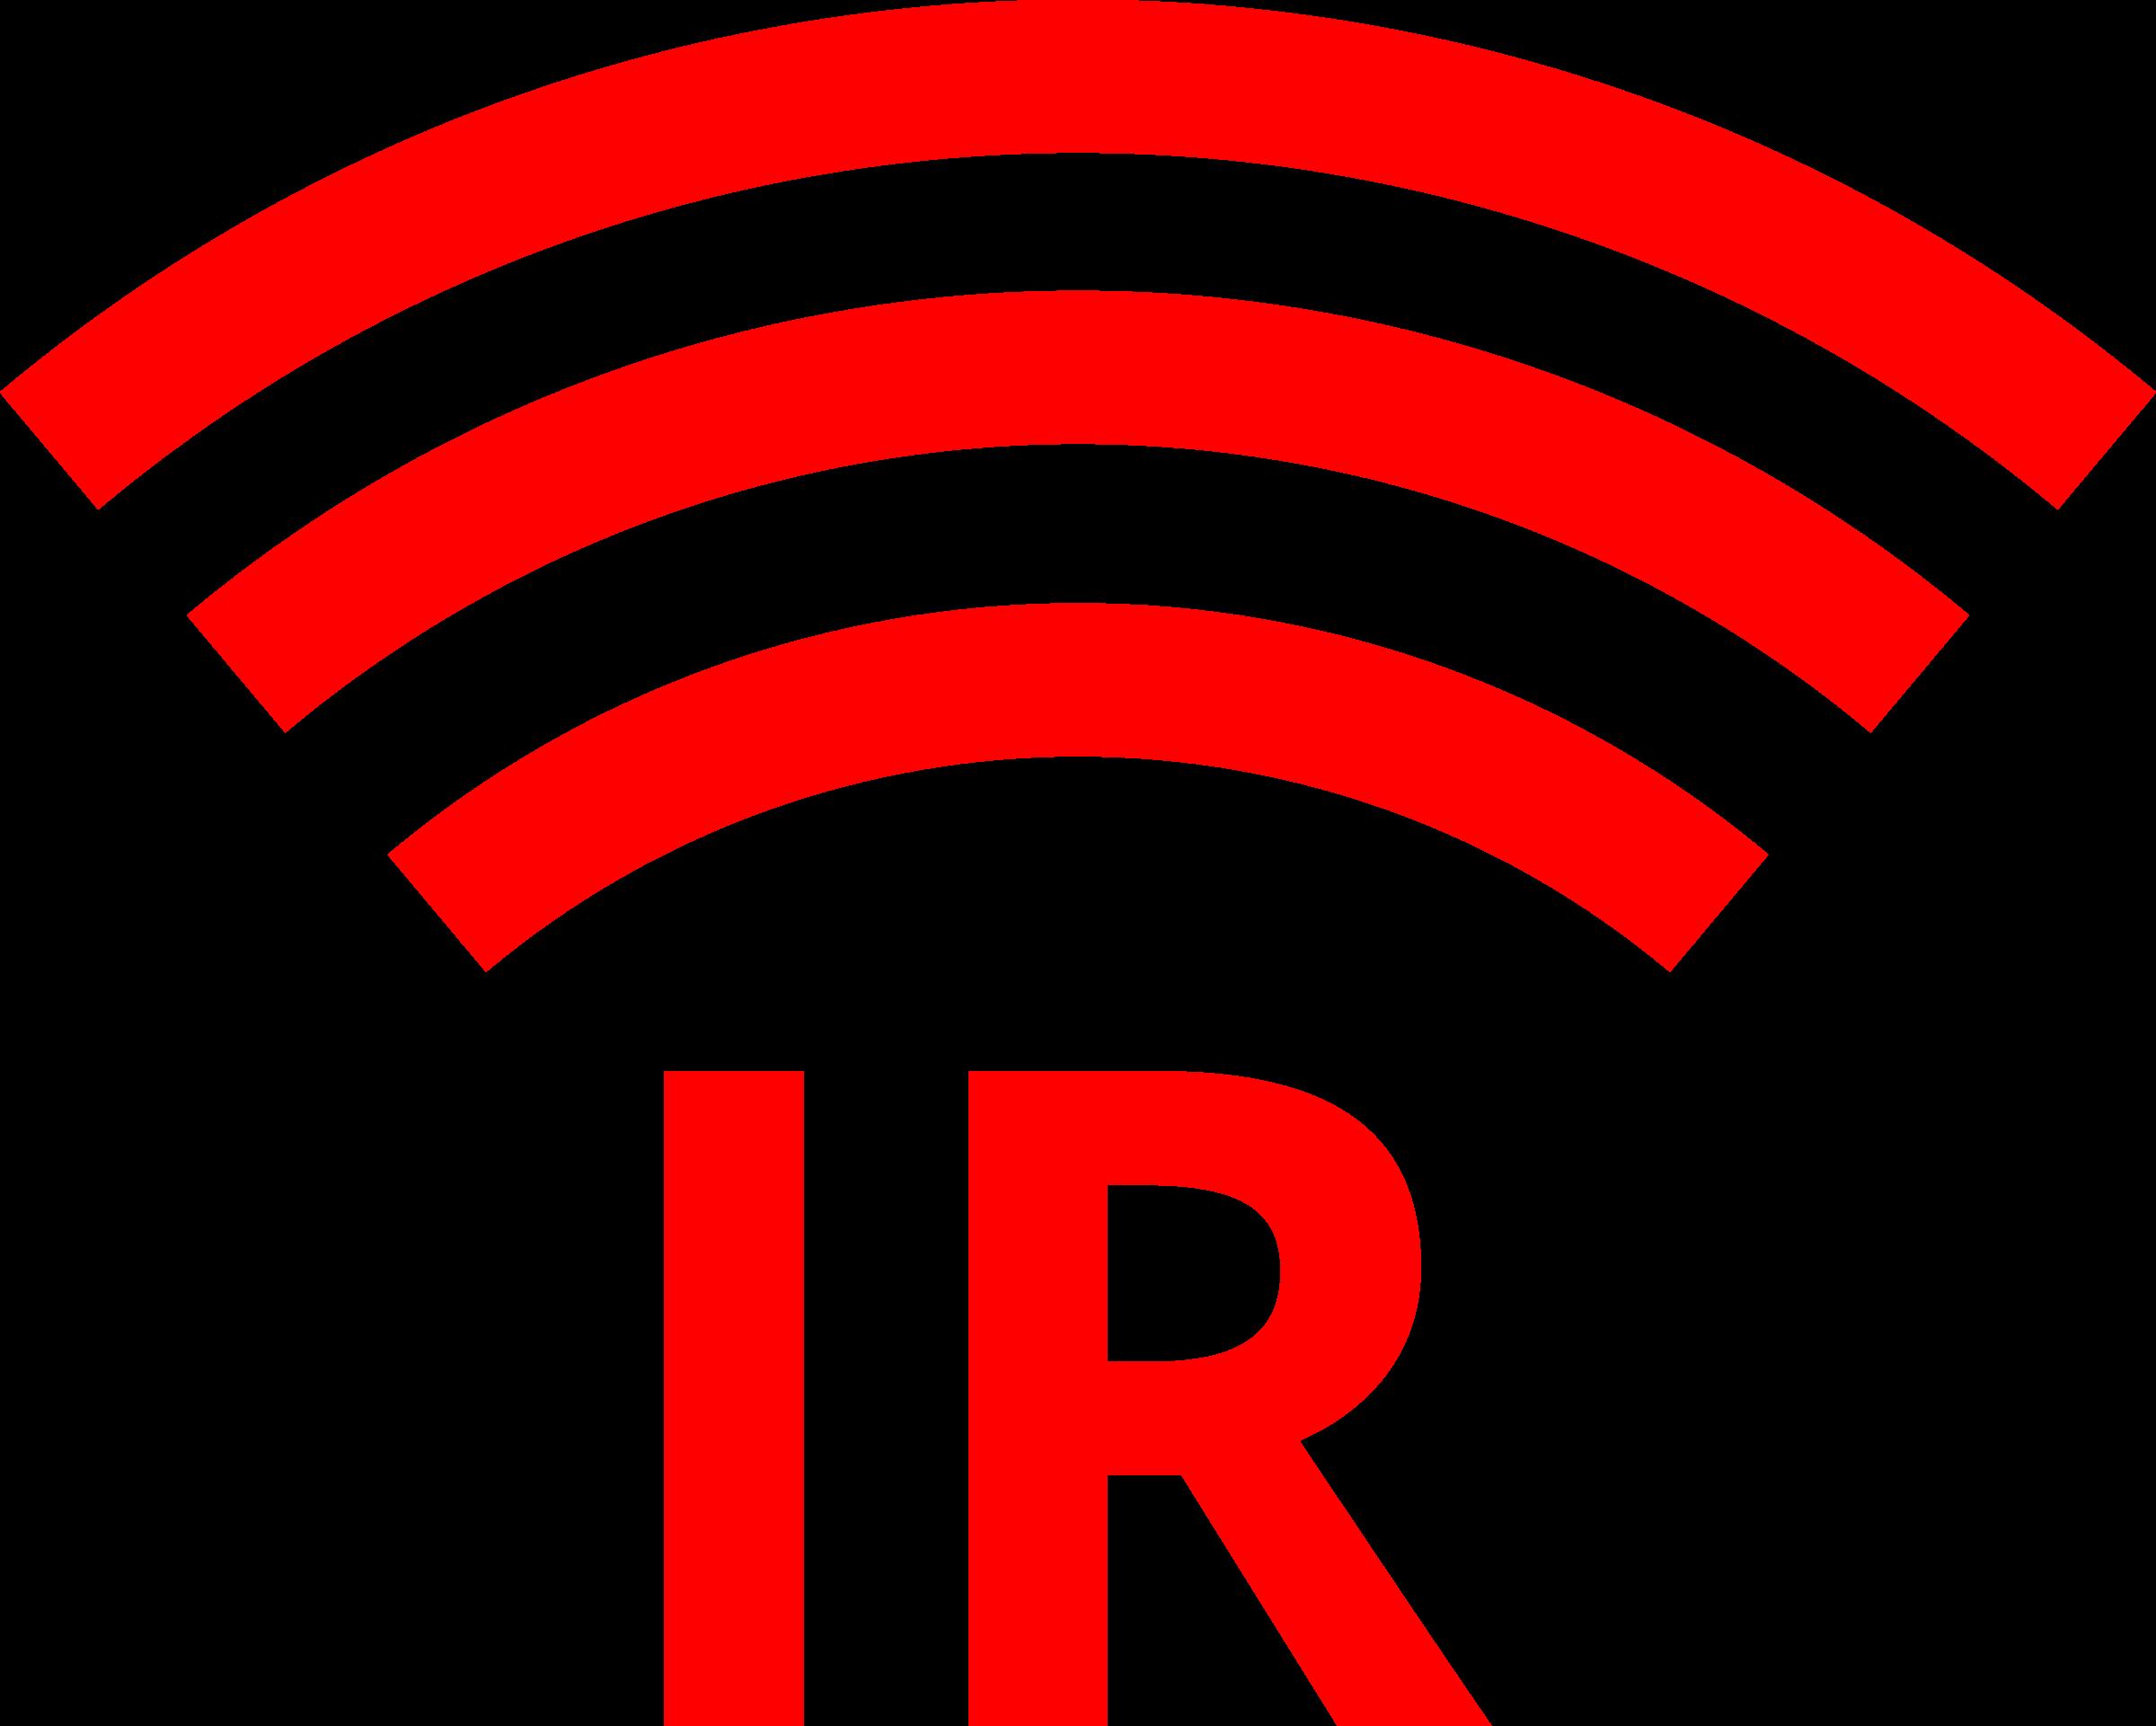 clipart ir symbol logo